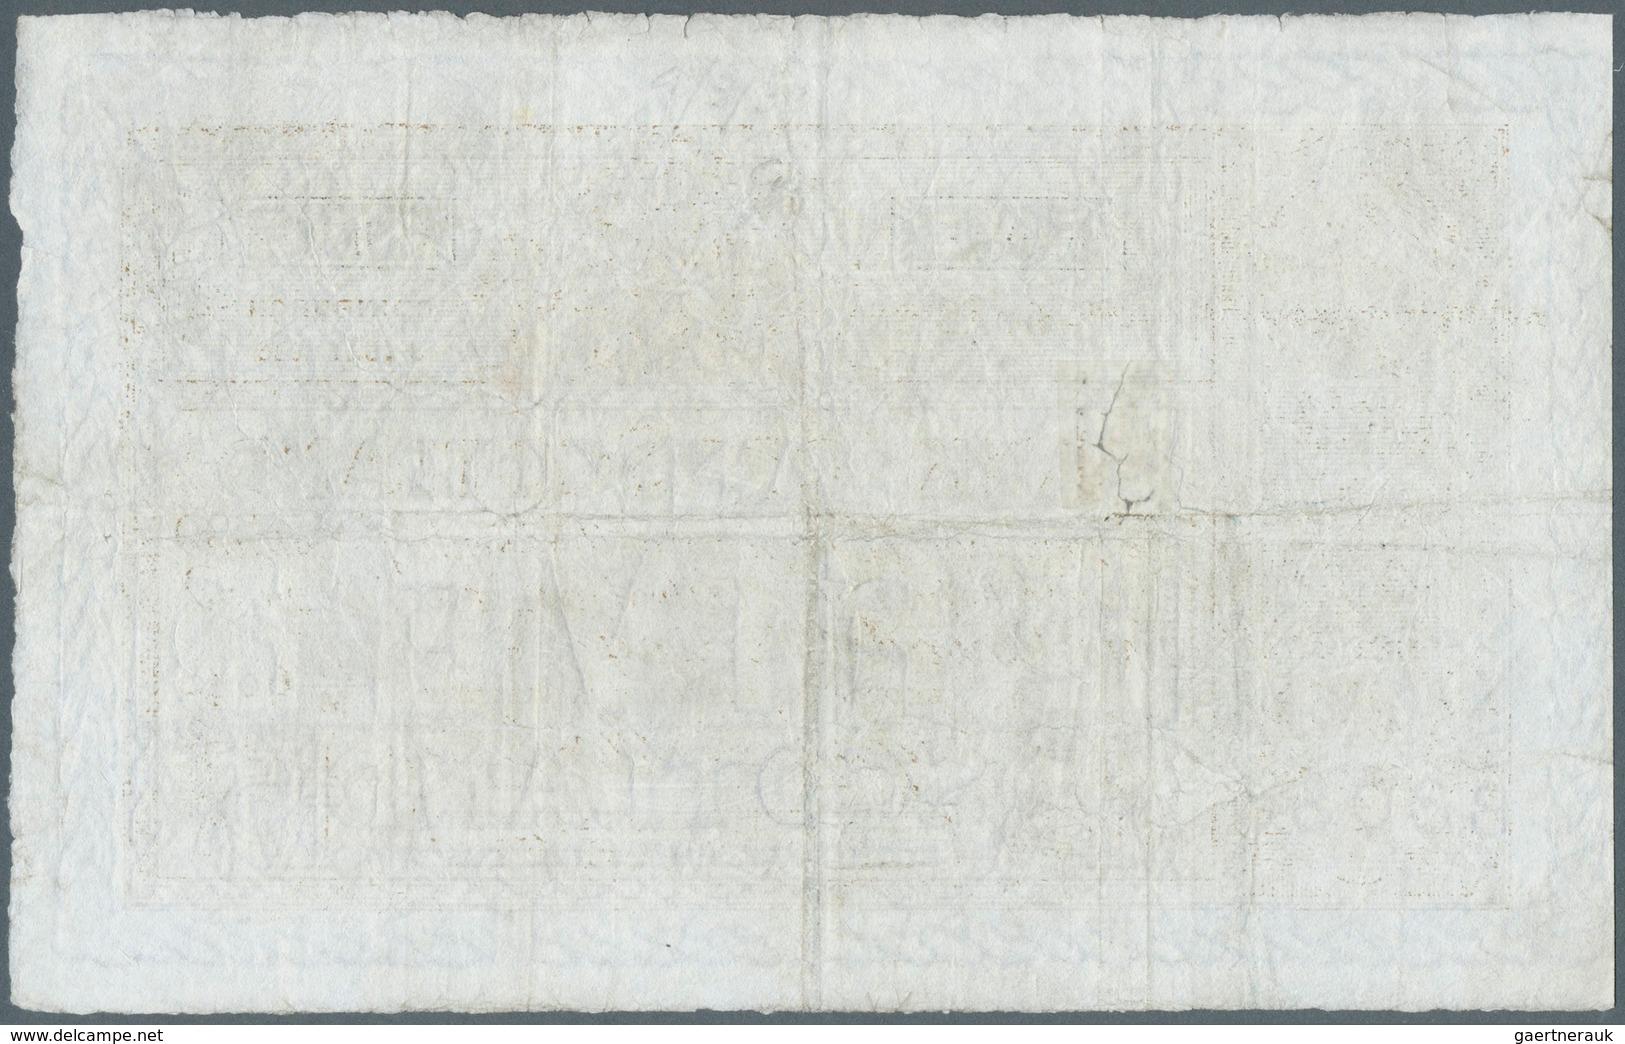 Scotland / Schottland: 5 Pounds 1936 P. 92a, Border Wear At Upper Border, Several Vertical And Horiz - [ 3] Scotland